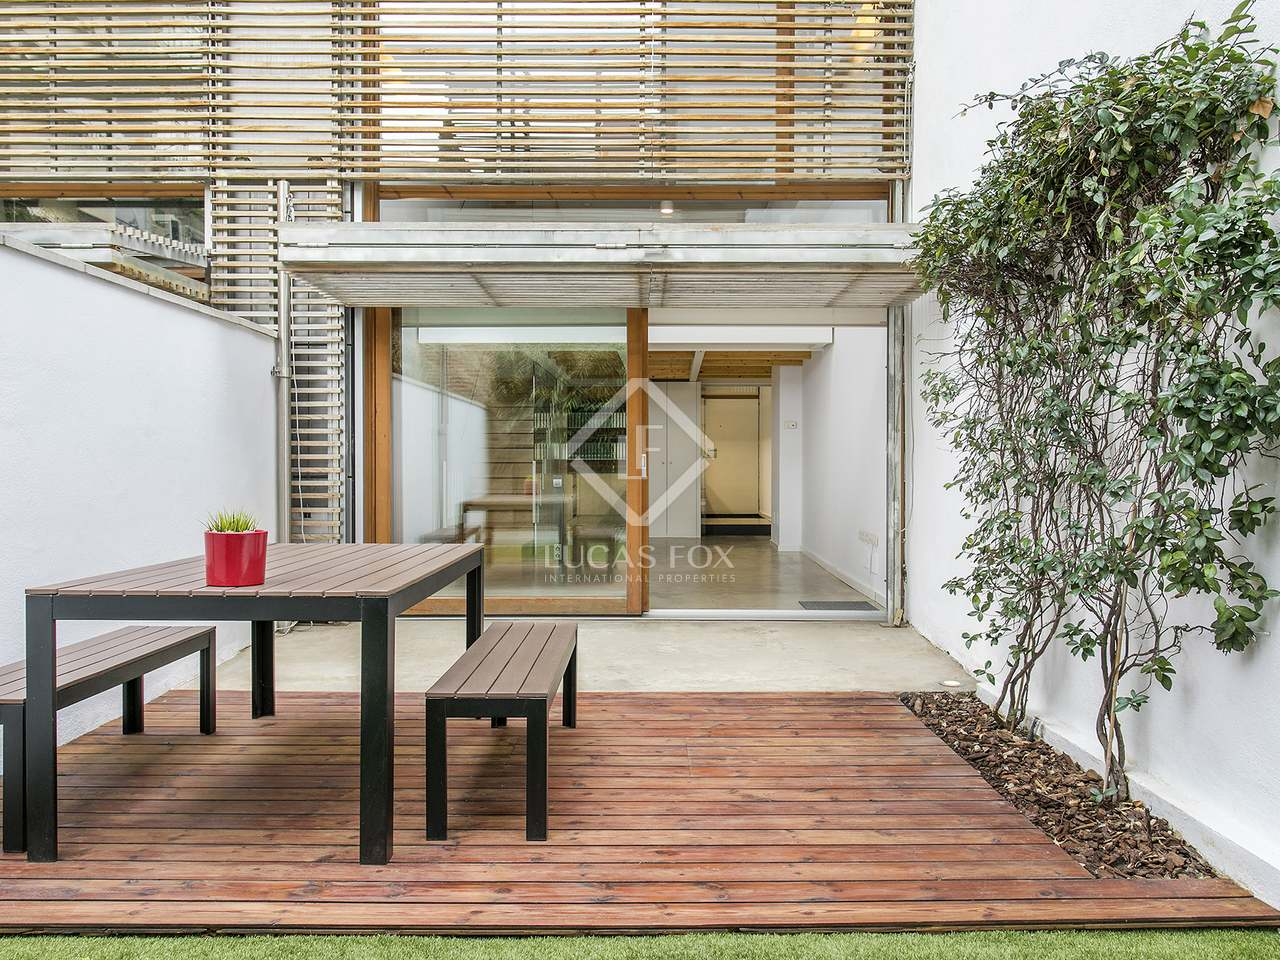 Casa de 140m en alquiler en poblenou barcelona for Casa con jardin alquiler barcelona